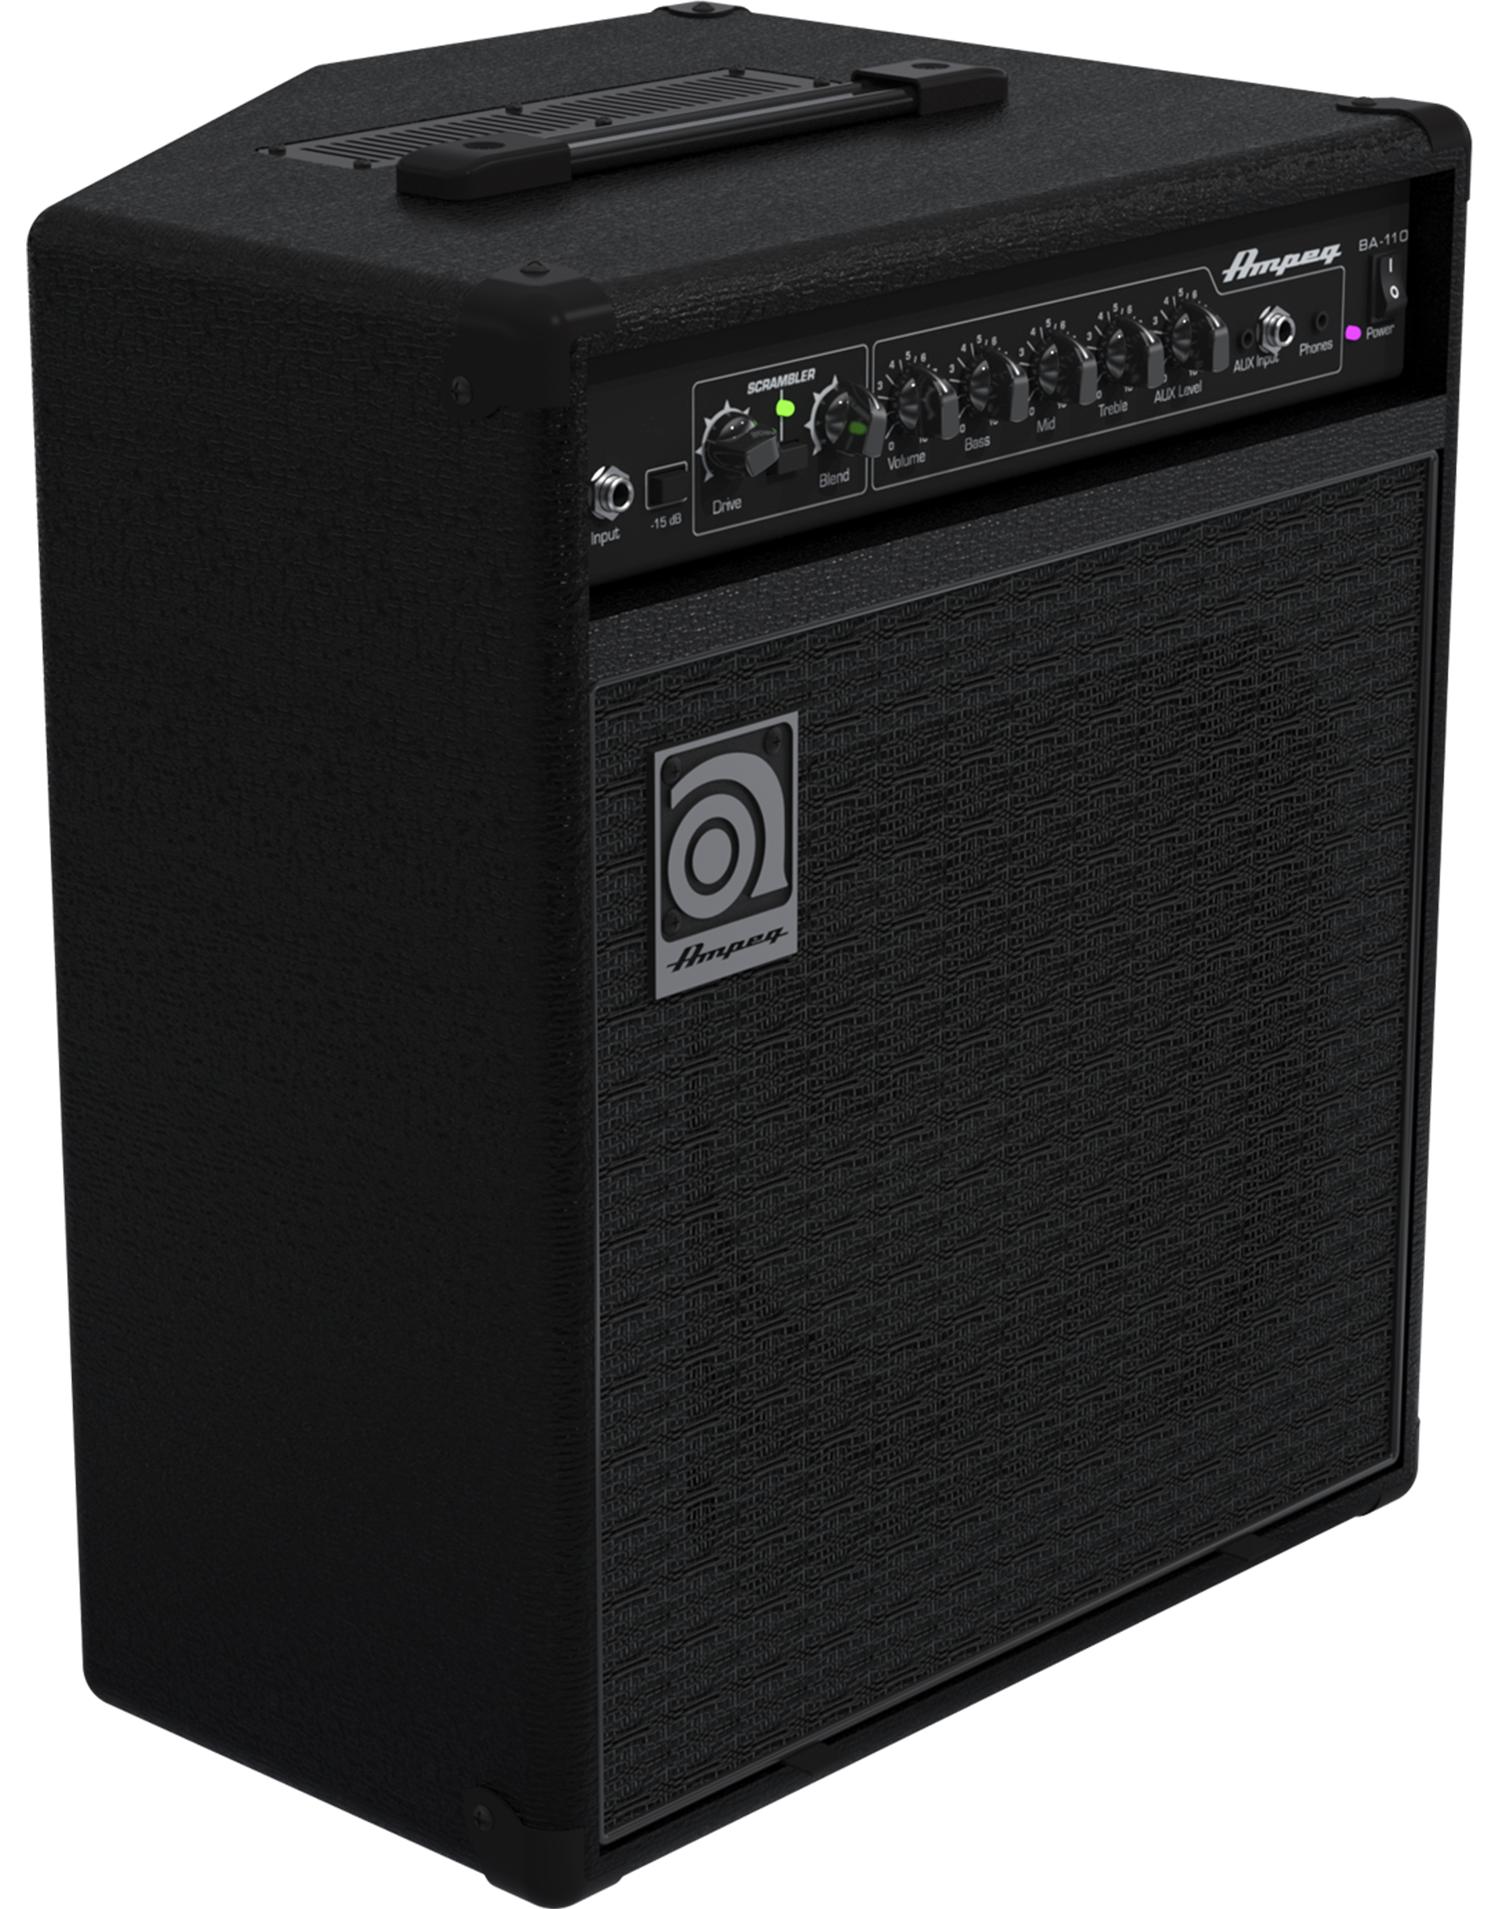 ampeg ba 110 electric bass guitar amp jerry lee 39 s music store. Black Bedroom Furniture Sets. Home Design Ideas